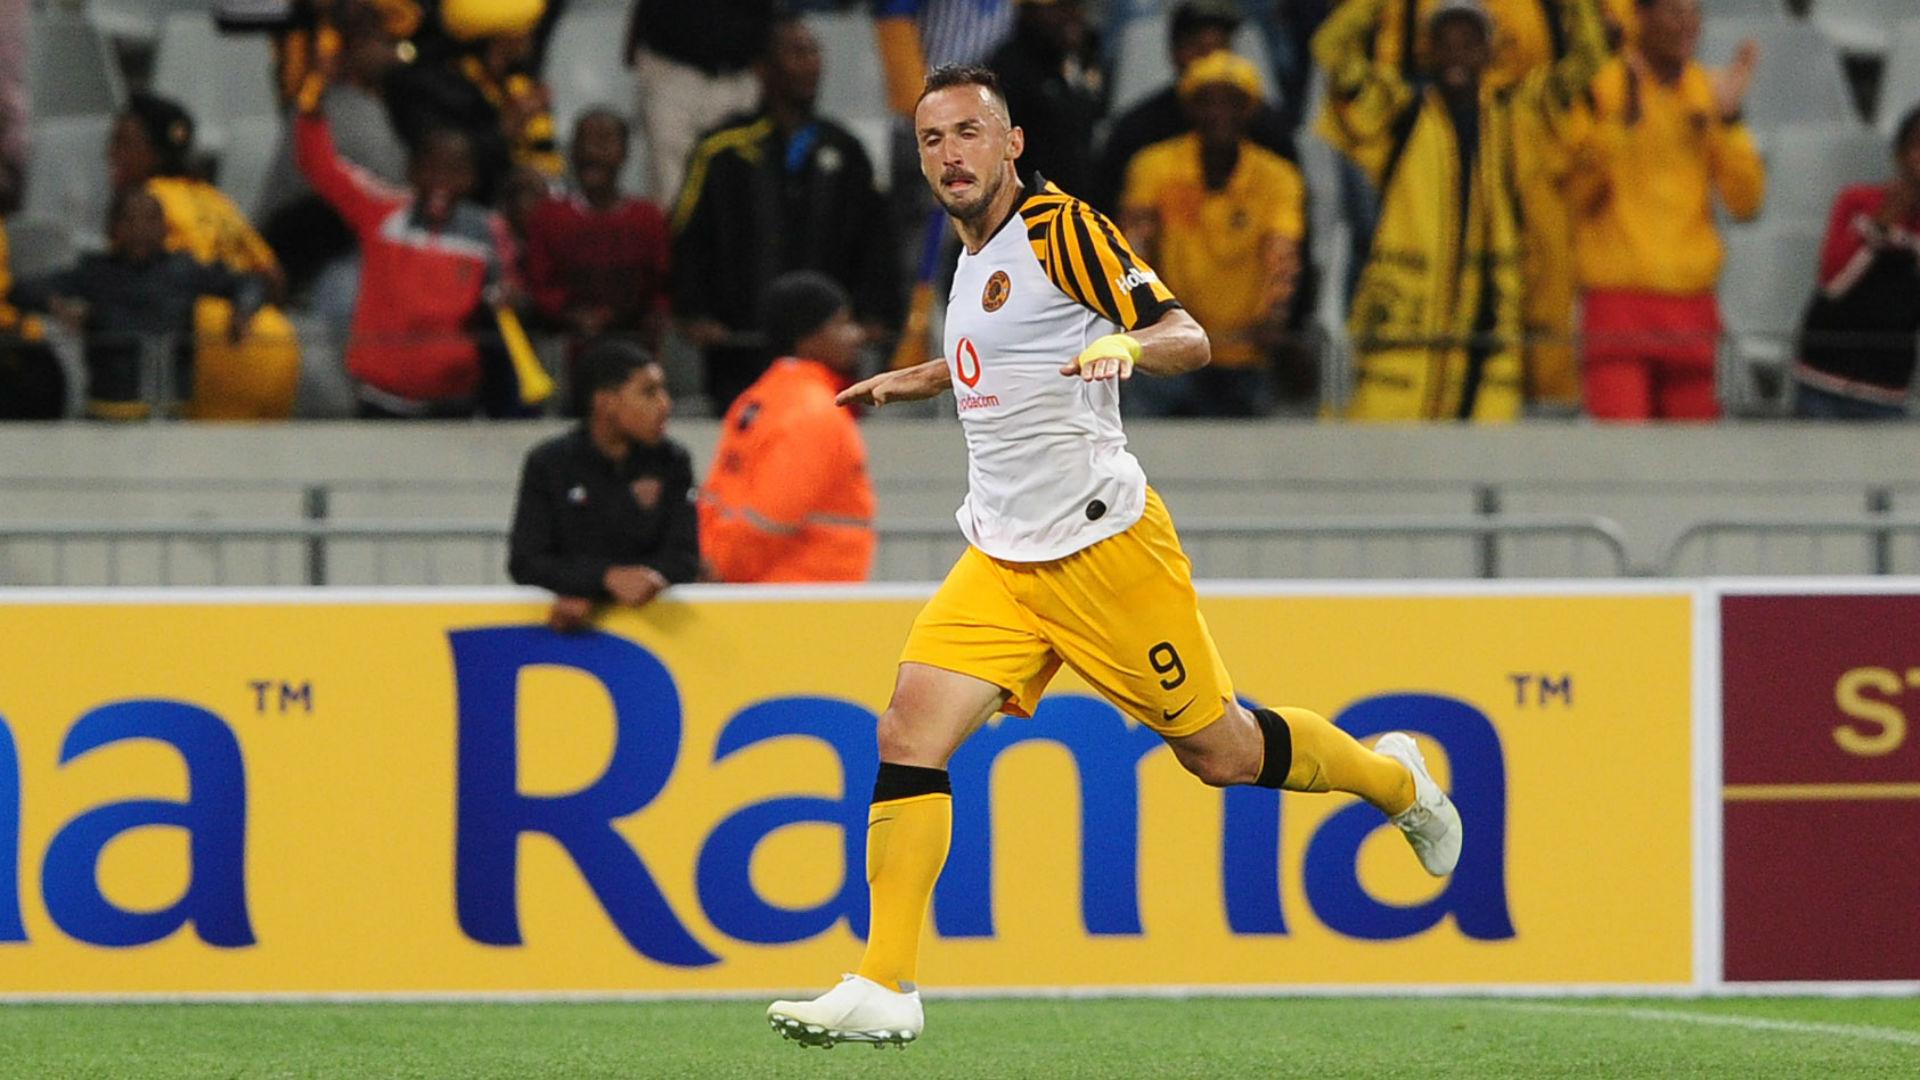 Ex-Kaizer Chiefs striker Nkhatha backs Nurkovic to overtake Orlando Pirates' Mhango